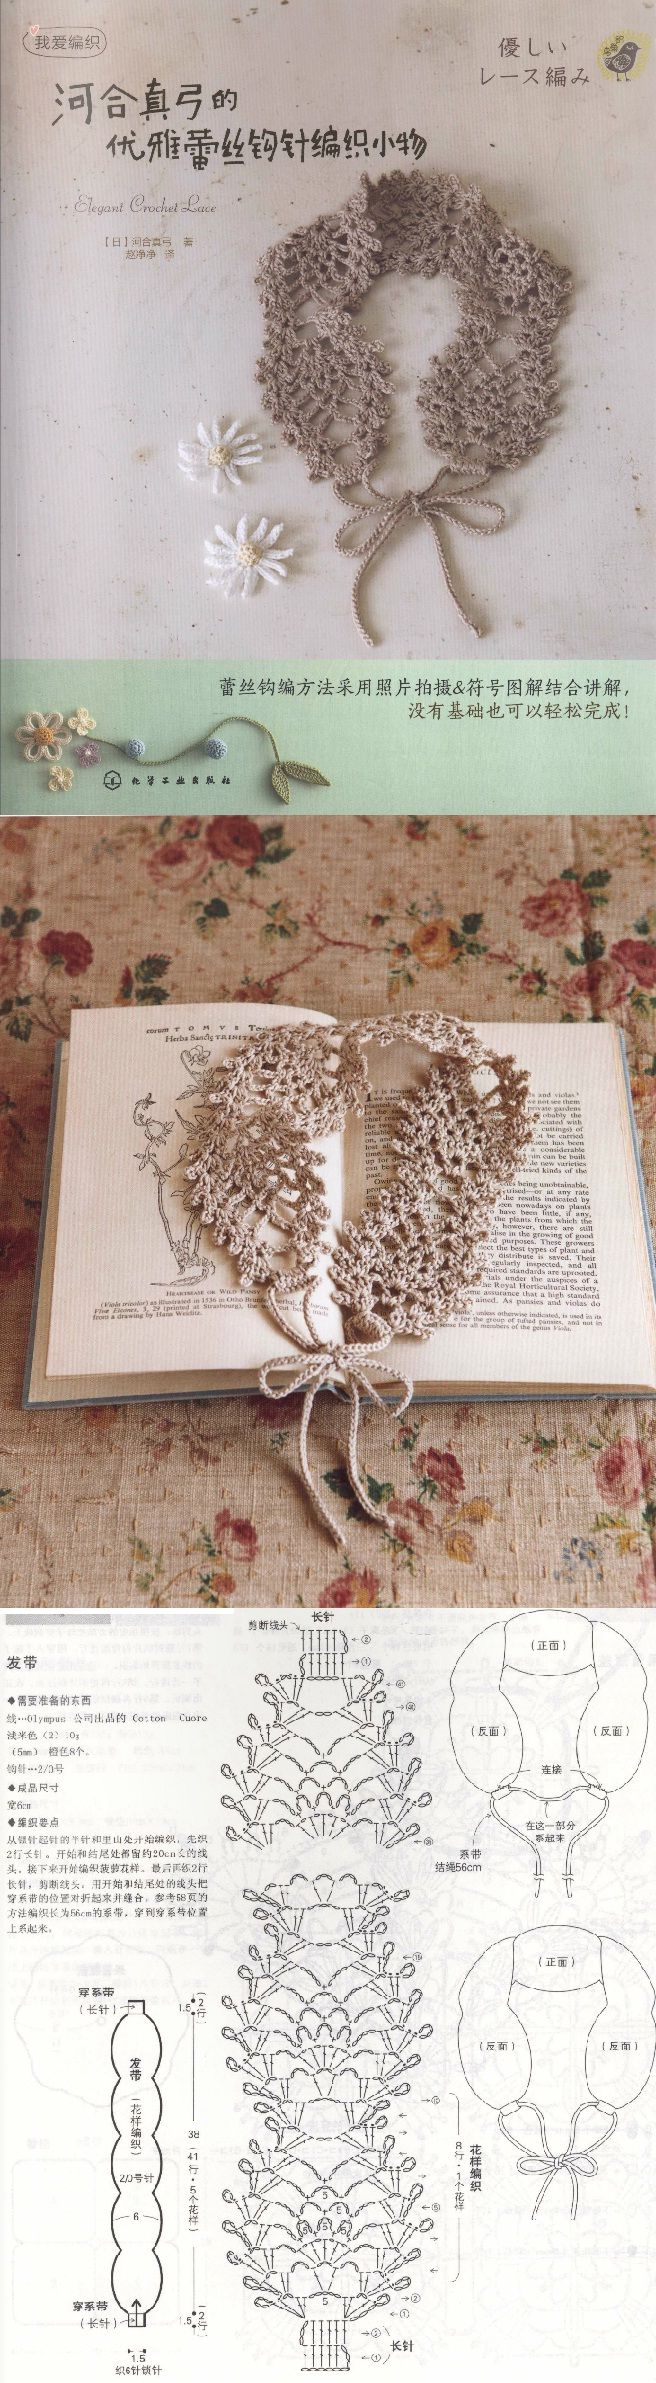 vlinderieke/elegant_crochet_lace